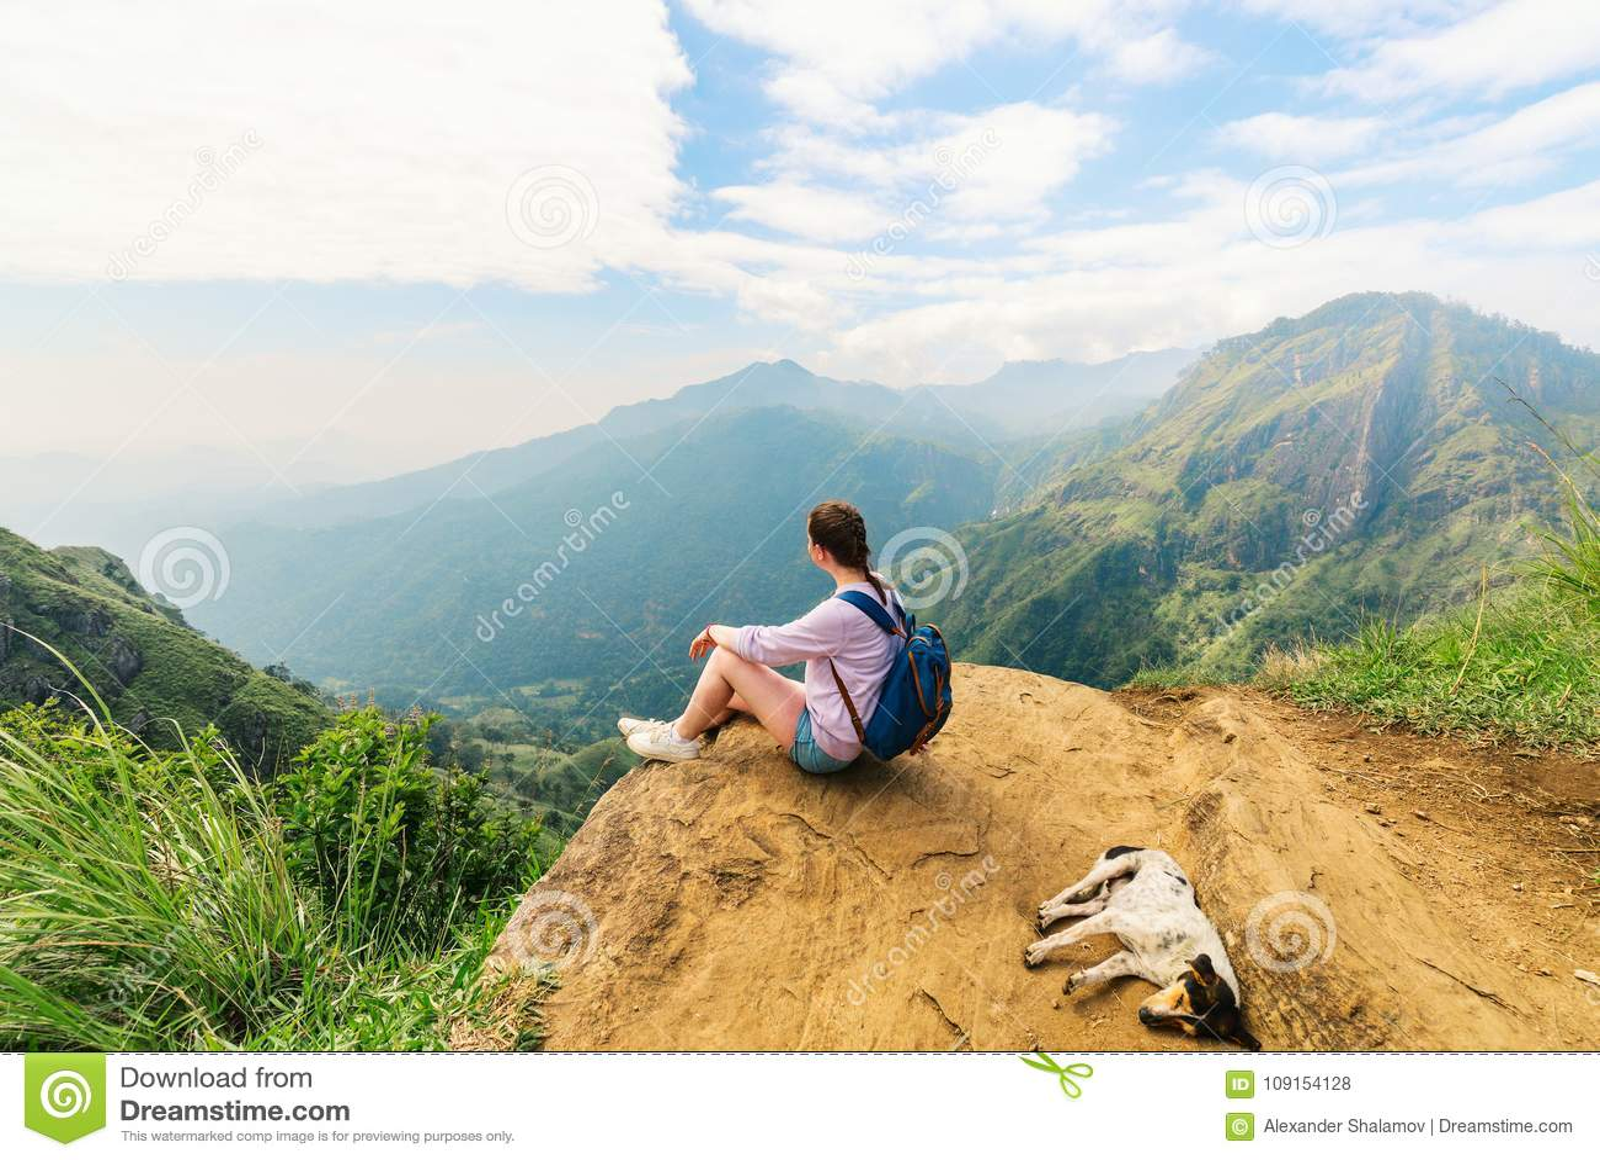 182afcfdb Young woman enjoying breathtaking views over mountains and tea plantations  from Little Adams peak in Ella Sri Lanka